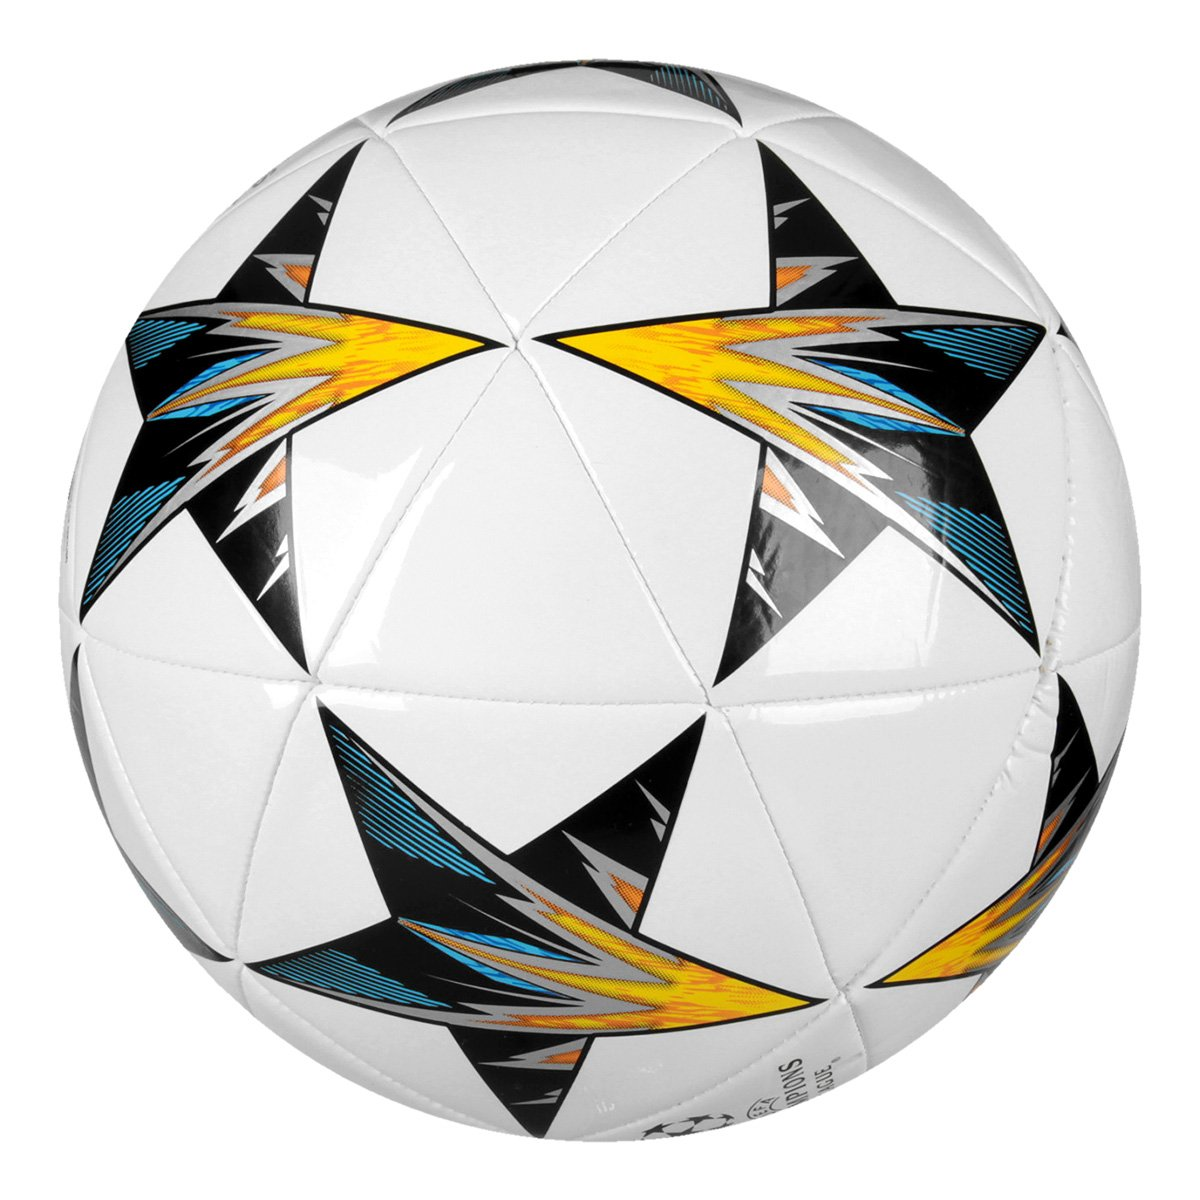 Bola Futebol Campo Adidas Finale Kiev Capitano - Branco e Chumbo ... 774c97889c8b8